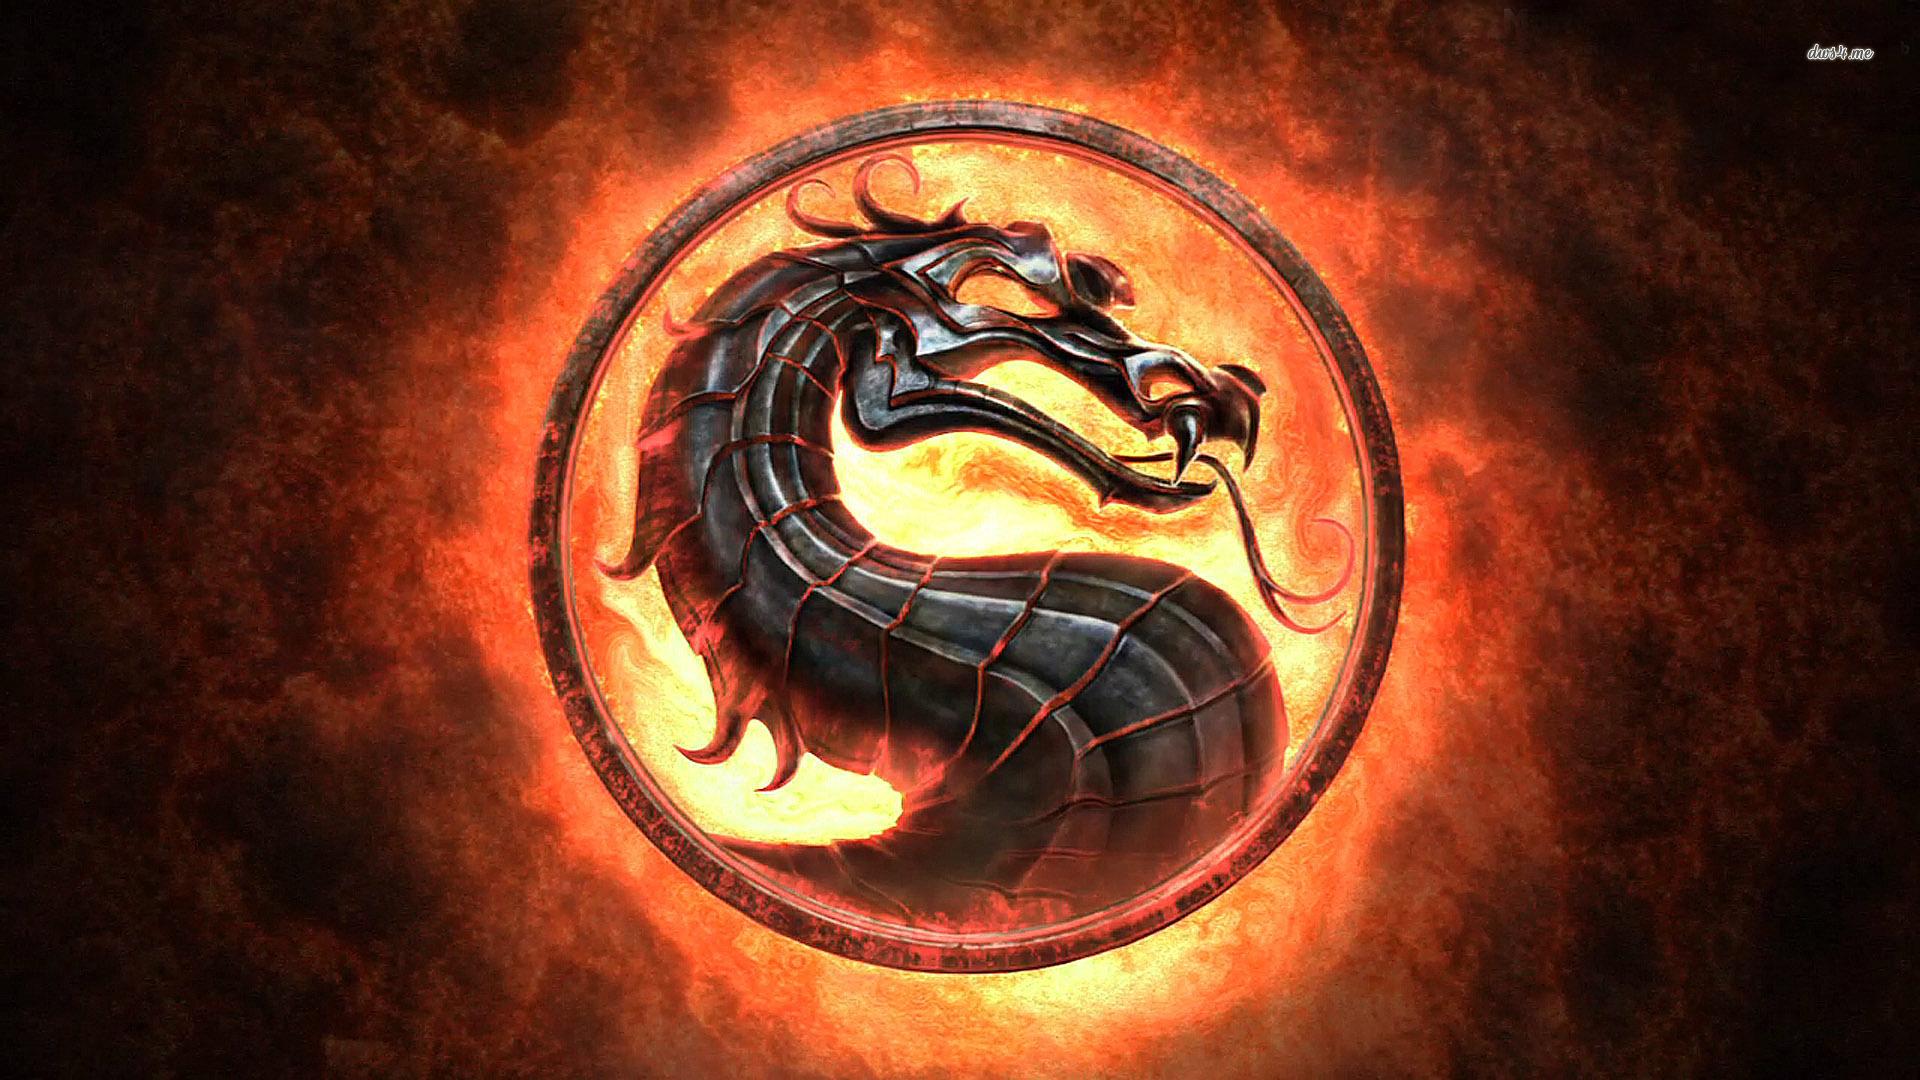 Mortal Kombat Background